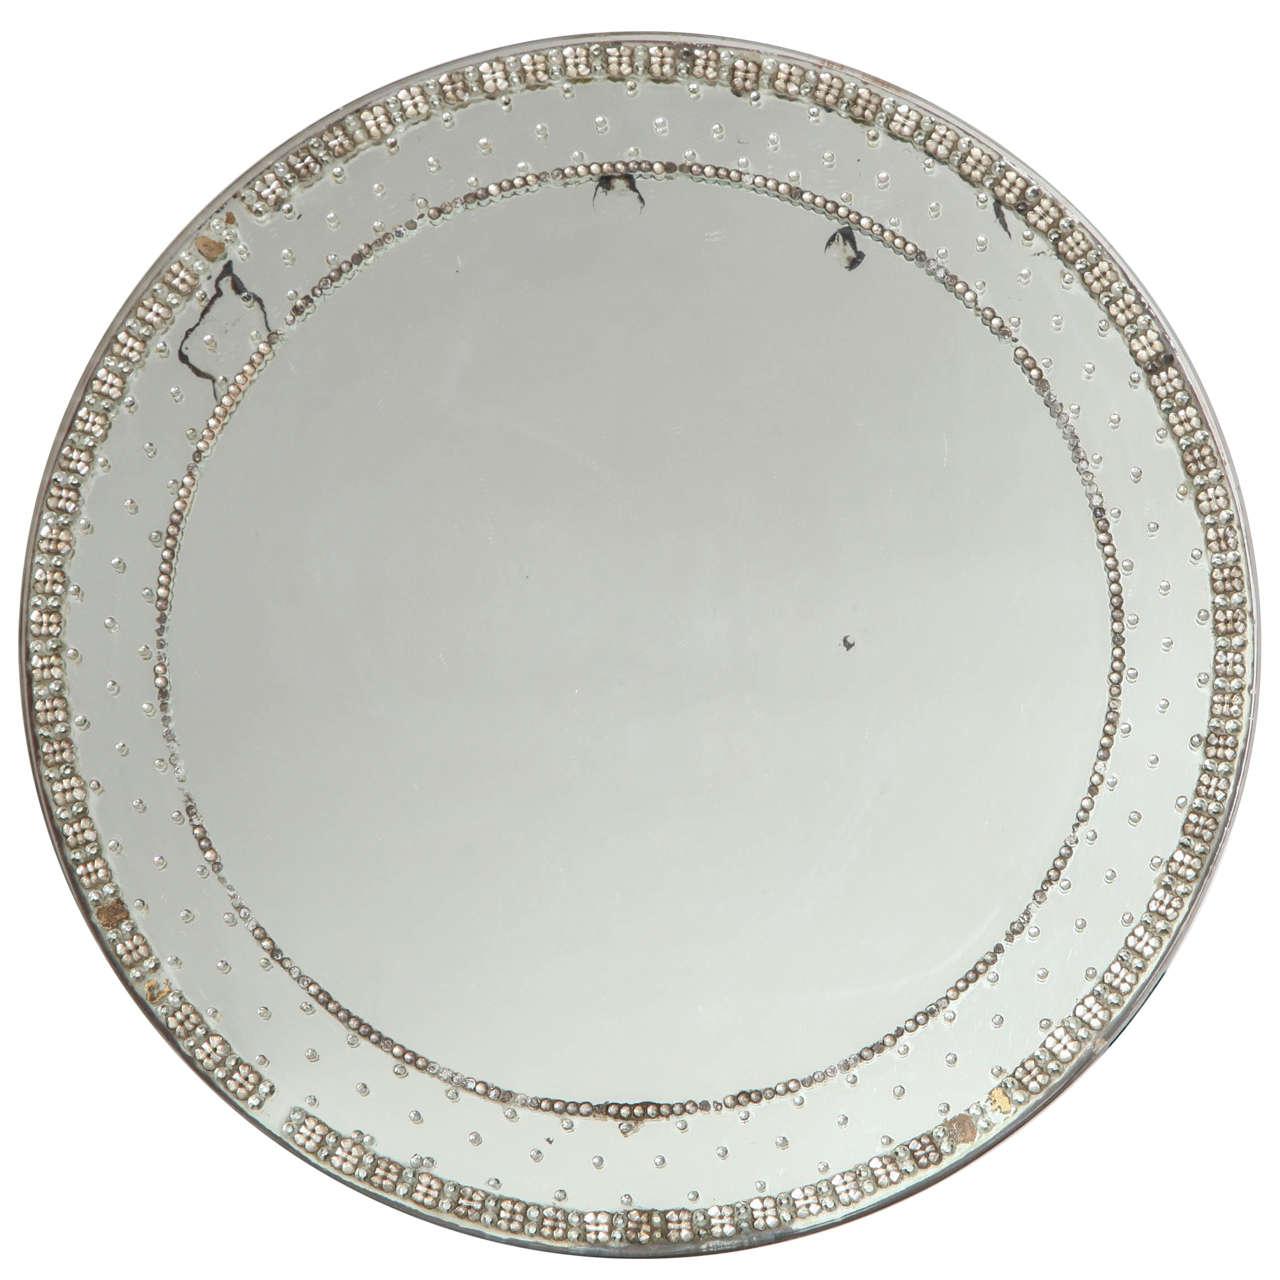 Art deco round glass jeweled standing vanity mirror for for Standing glass mirror